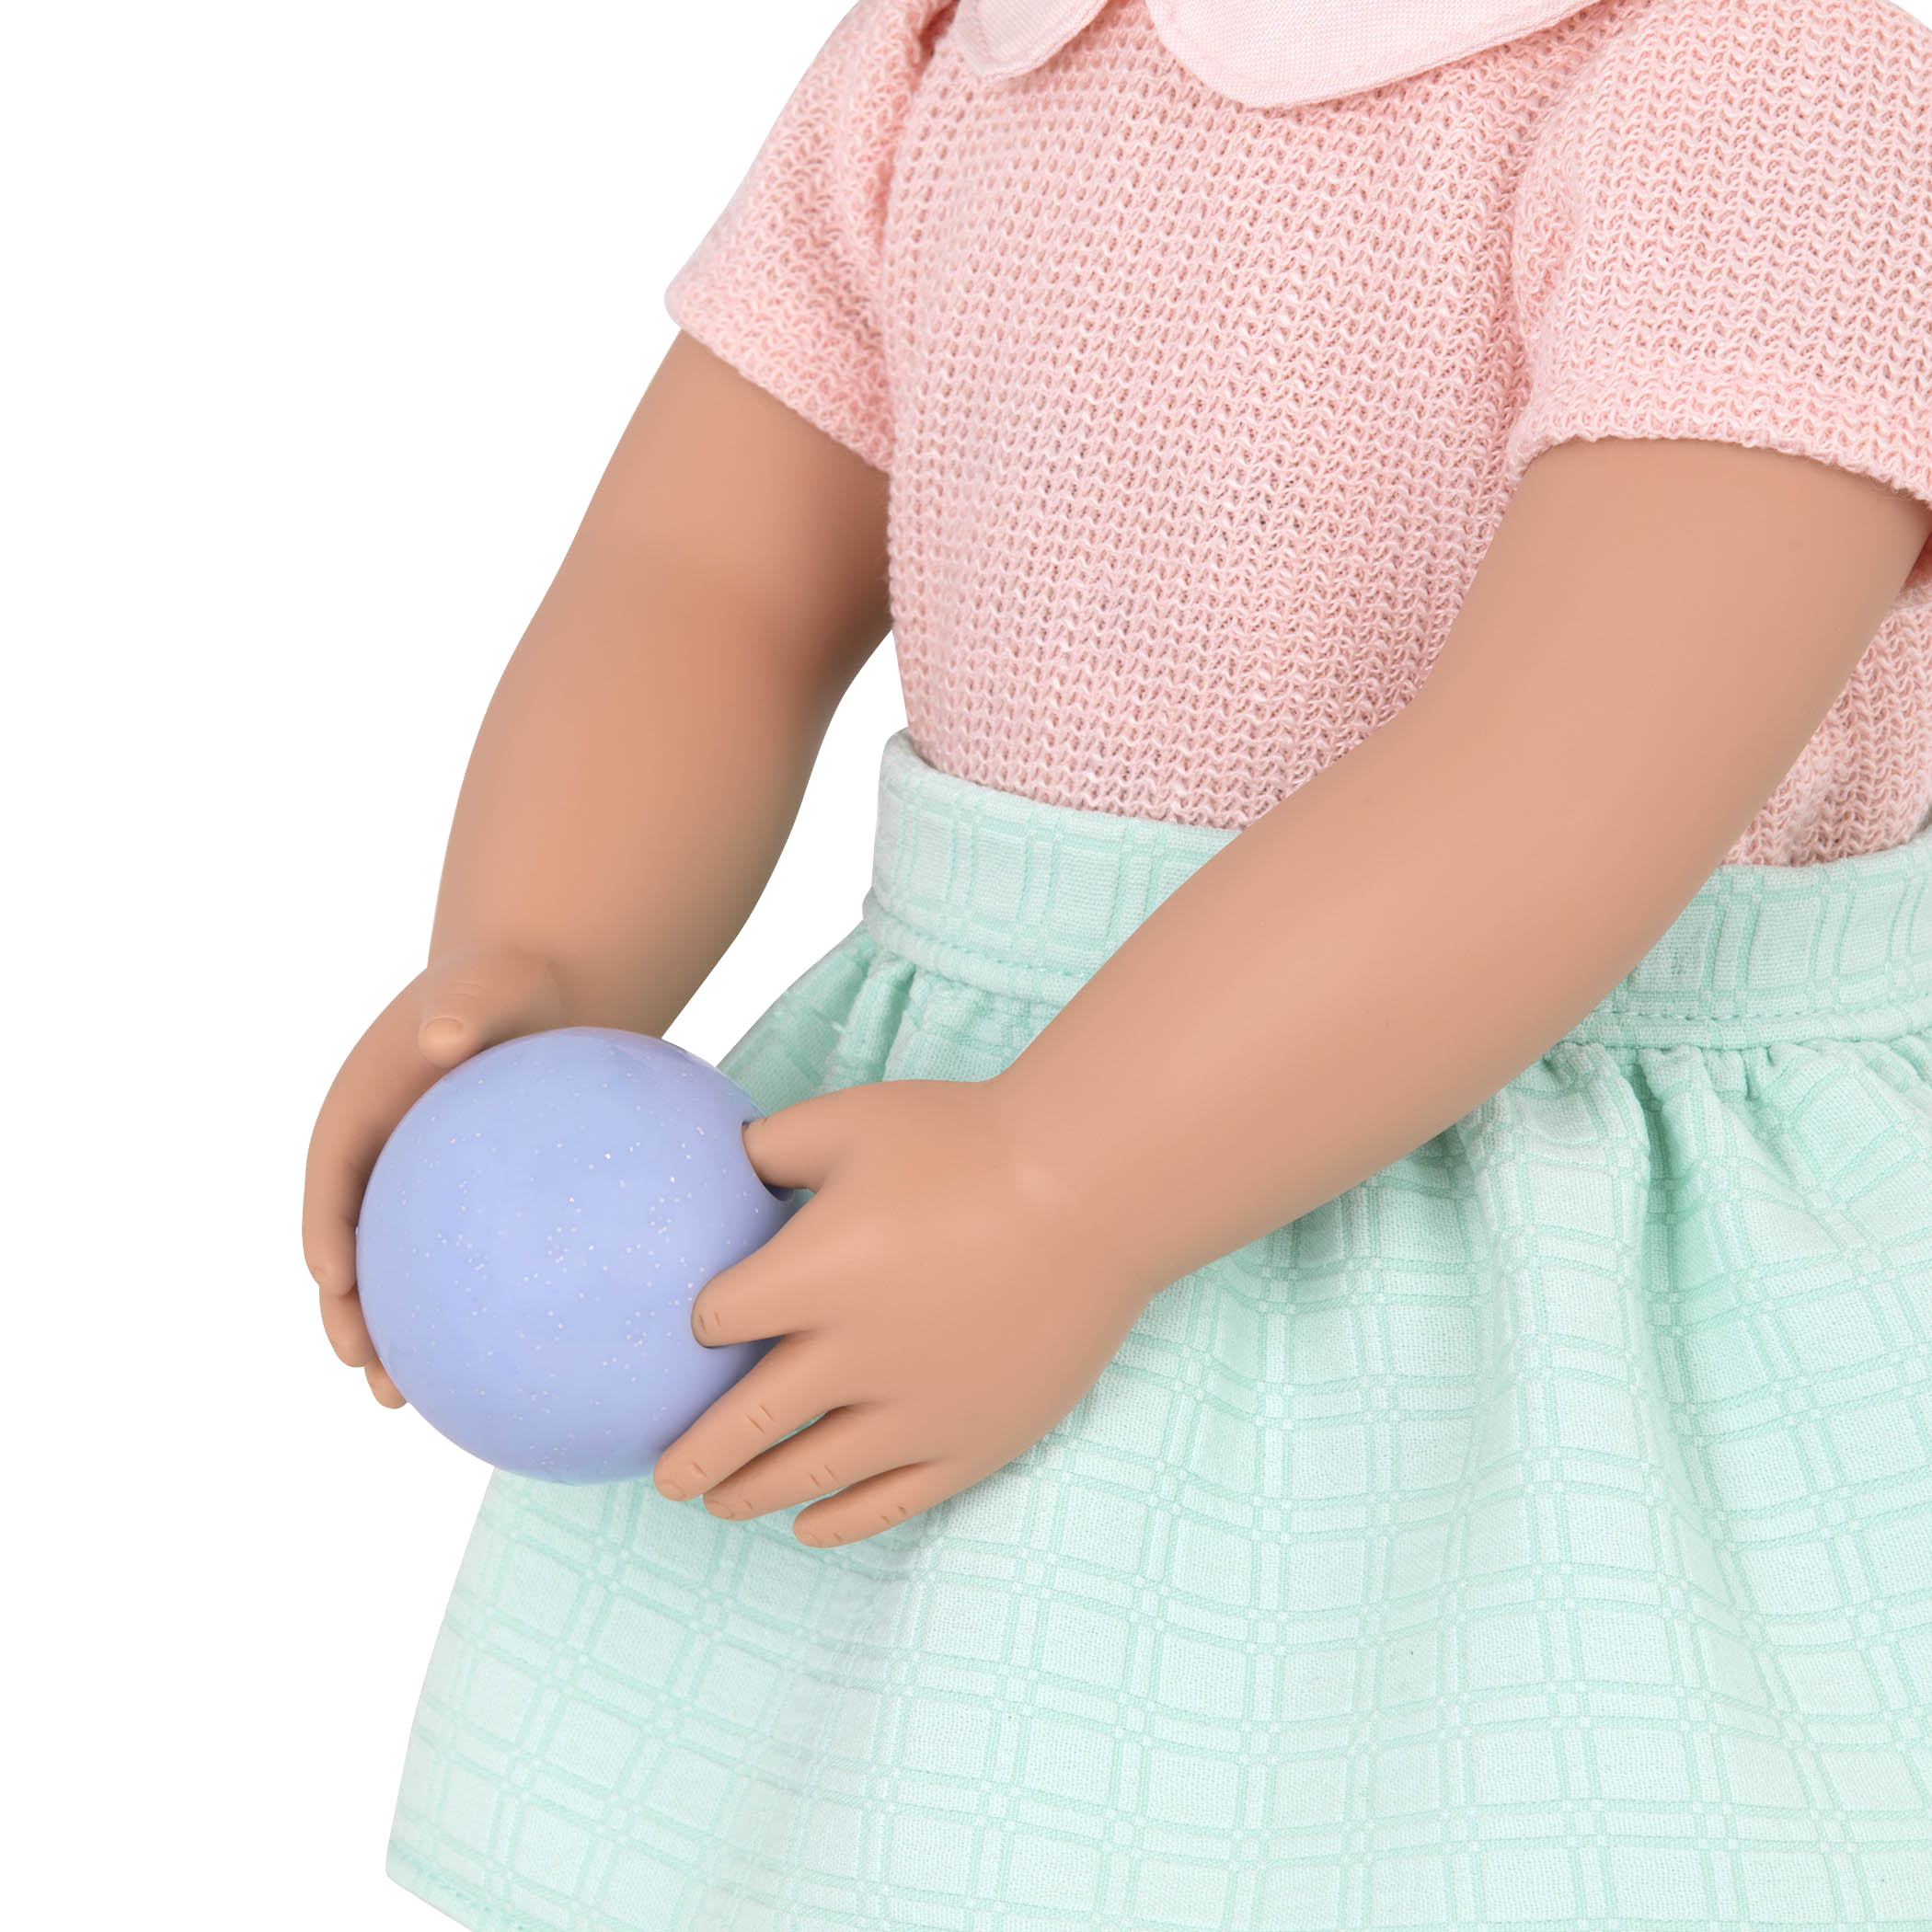 Detail of Kaye holding bowling ball